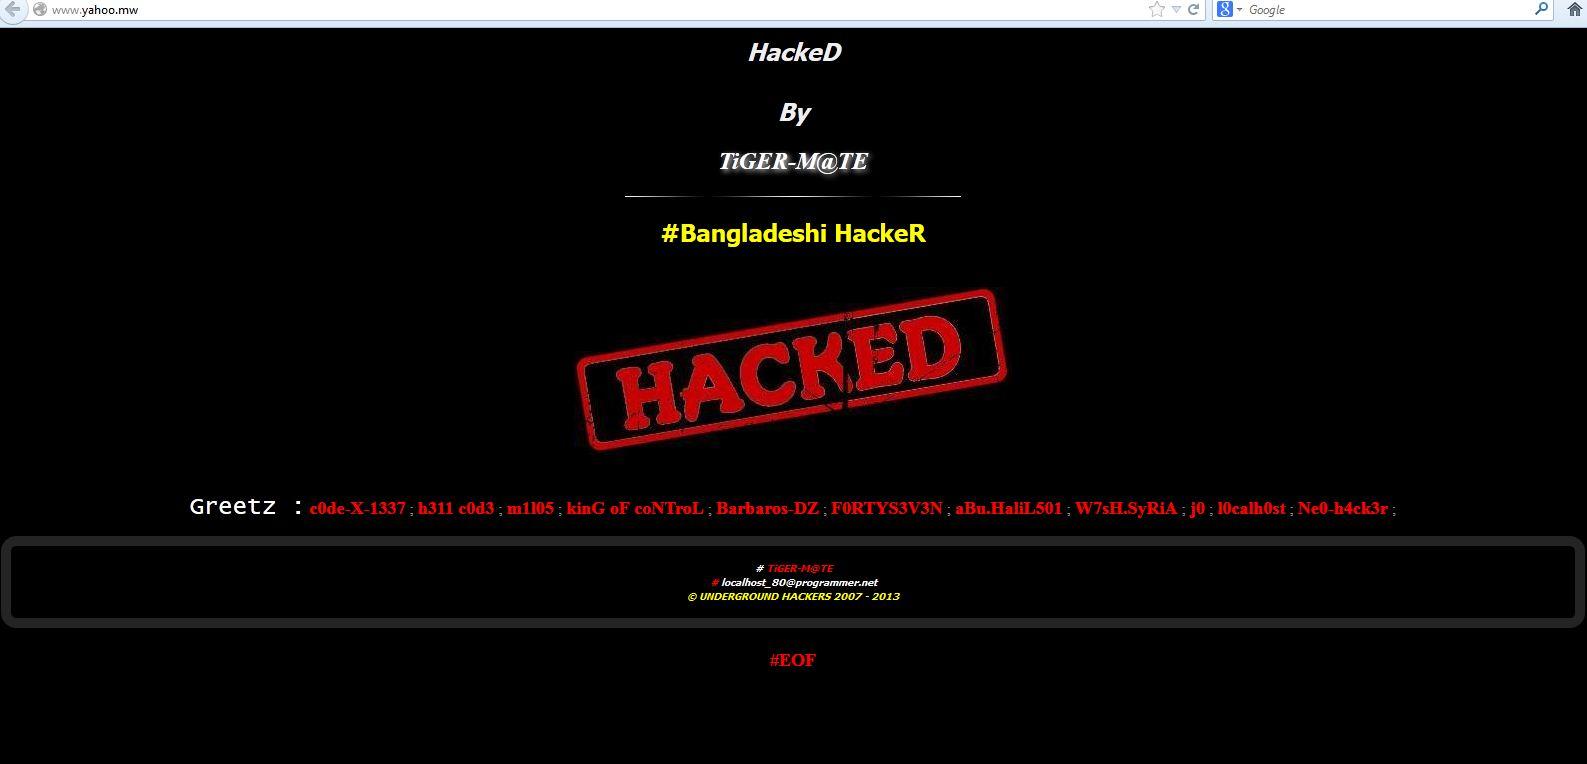 tiger-mate-Malawi-hacked